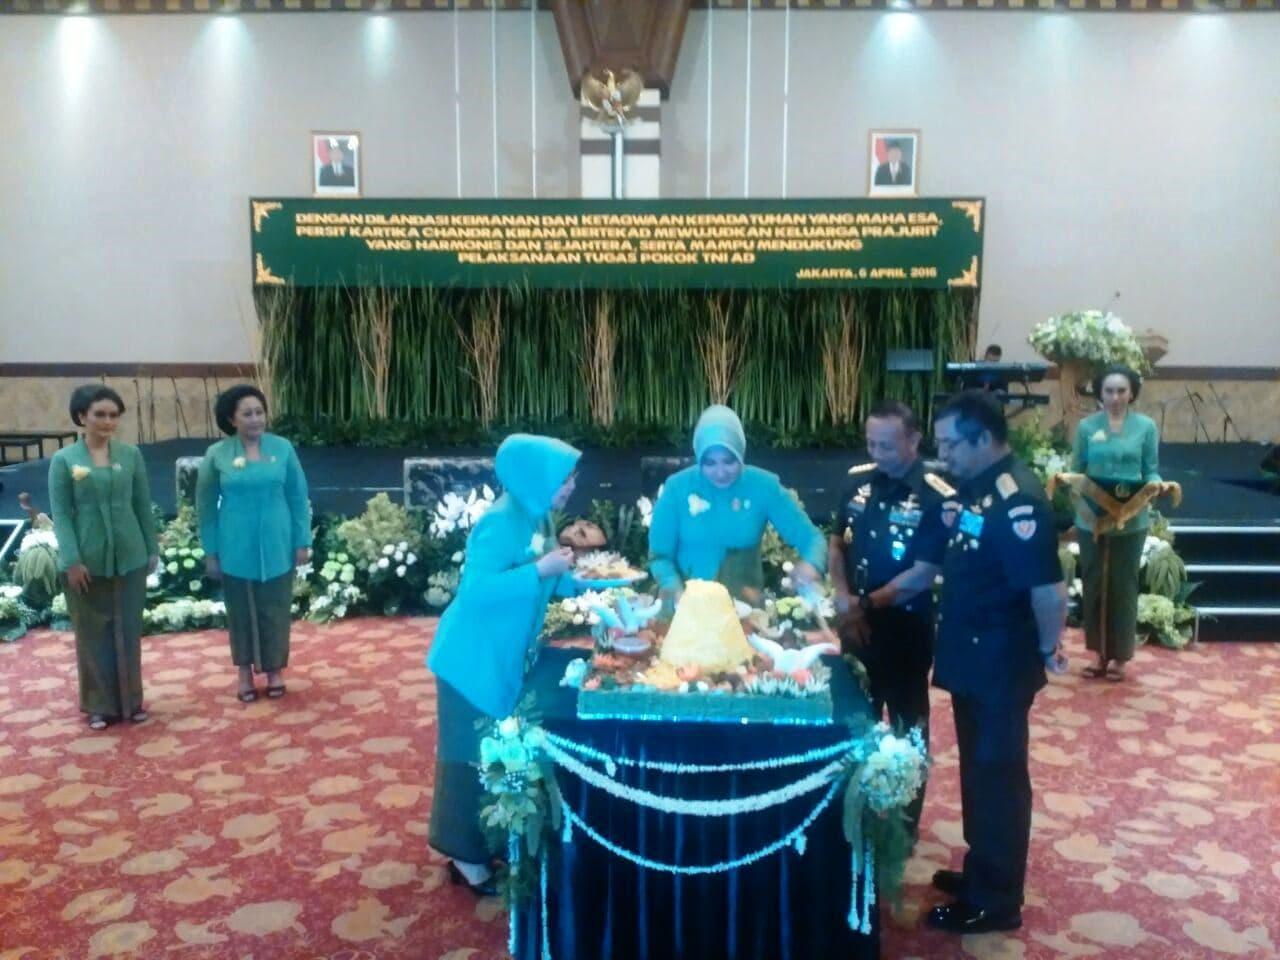 Pangdam Jaya Hadiri Acara HUT Persit KCK ke-70 di Balai Kartini a